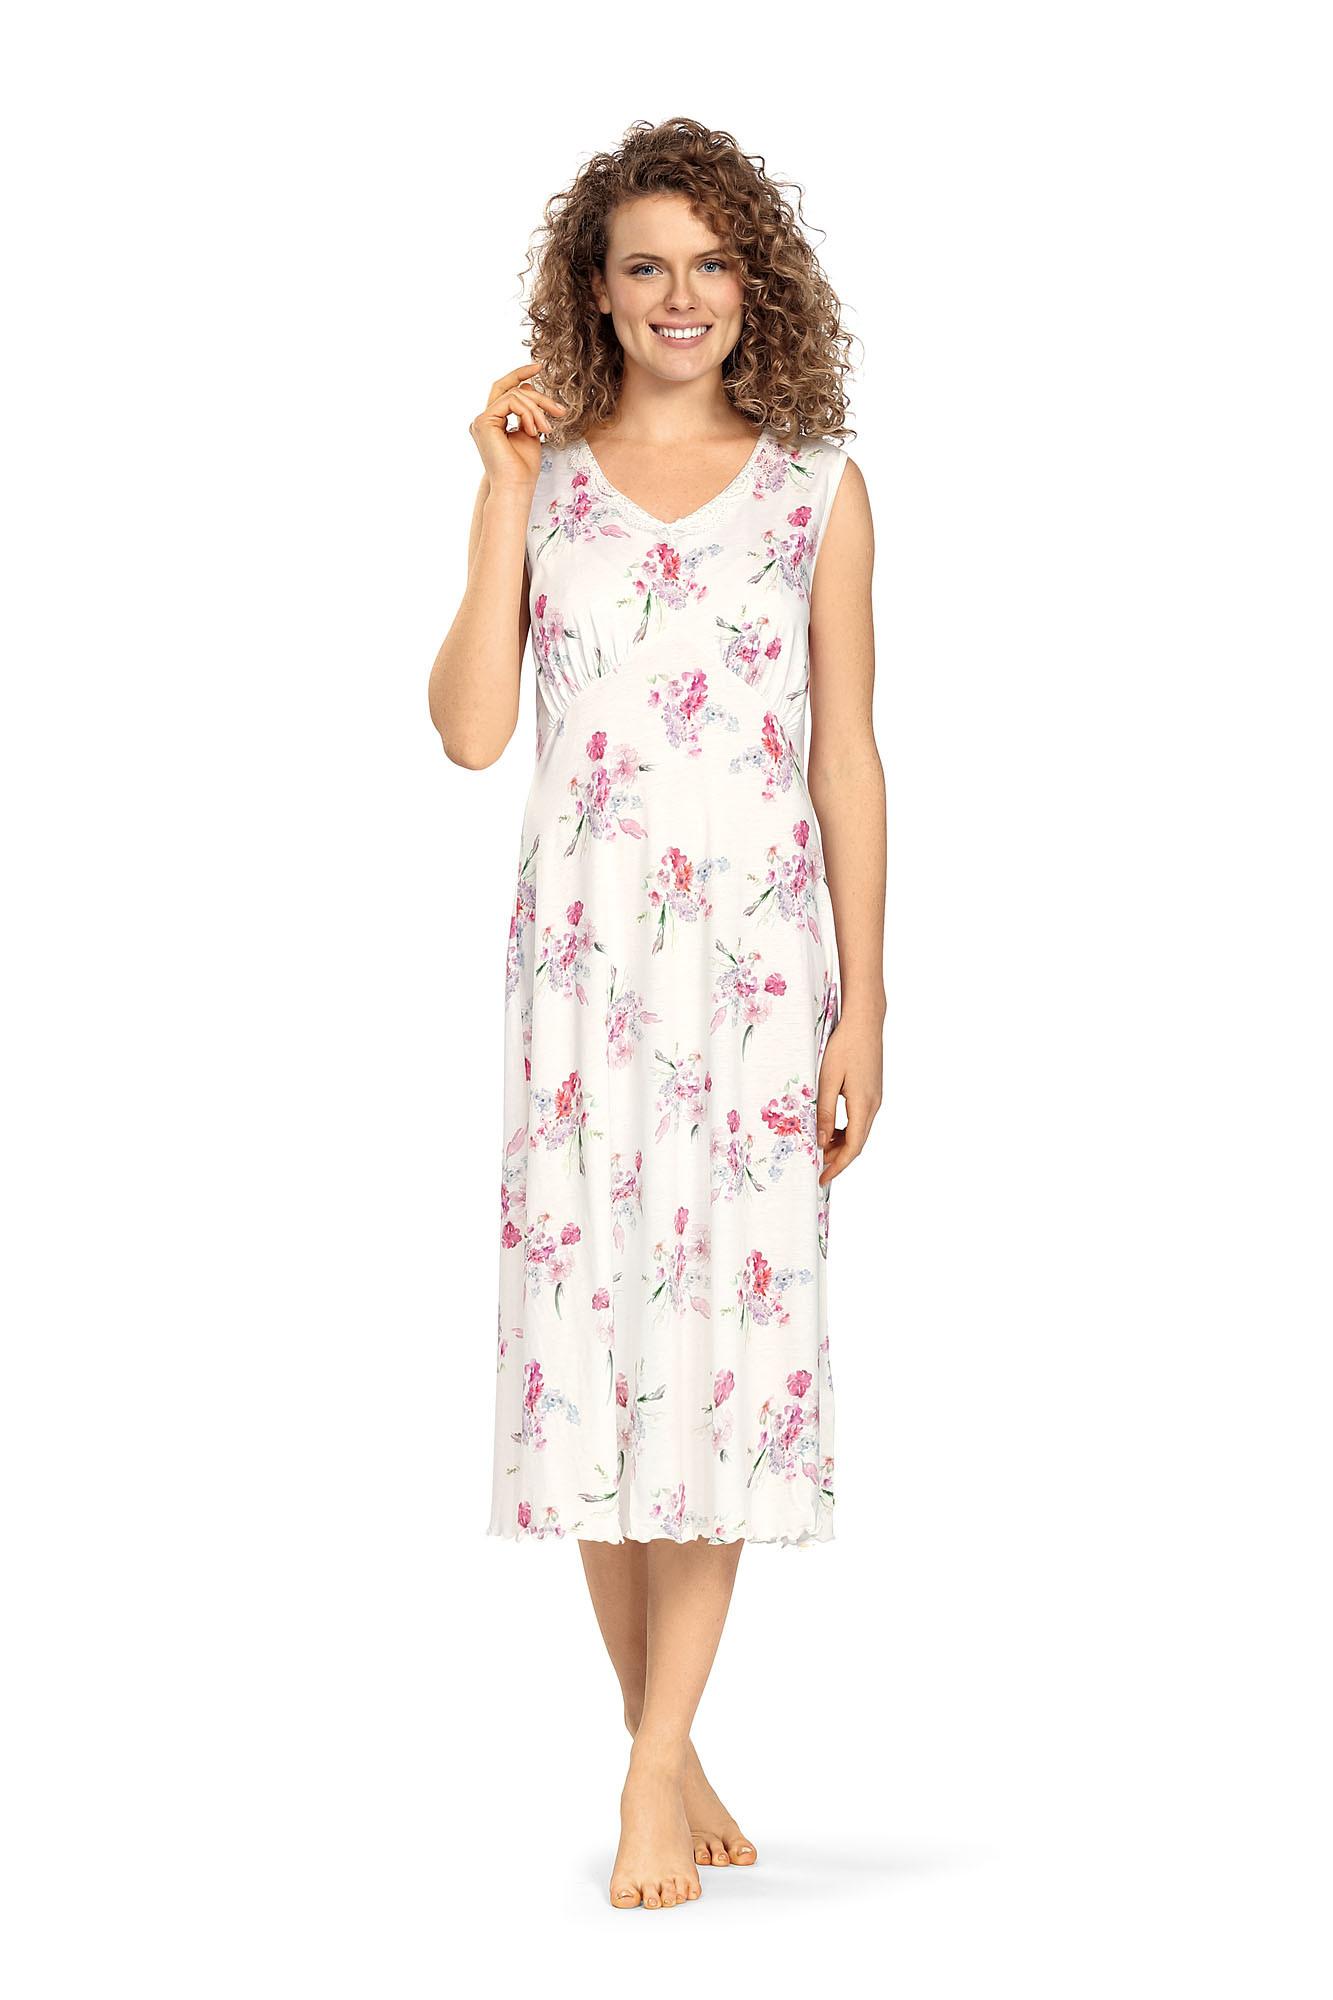 Comtessa Ascafa Damen Nachthemd ohne Arm lang Ecru Baumwolle Modal